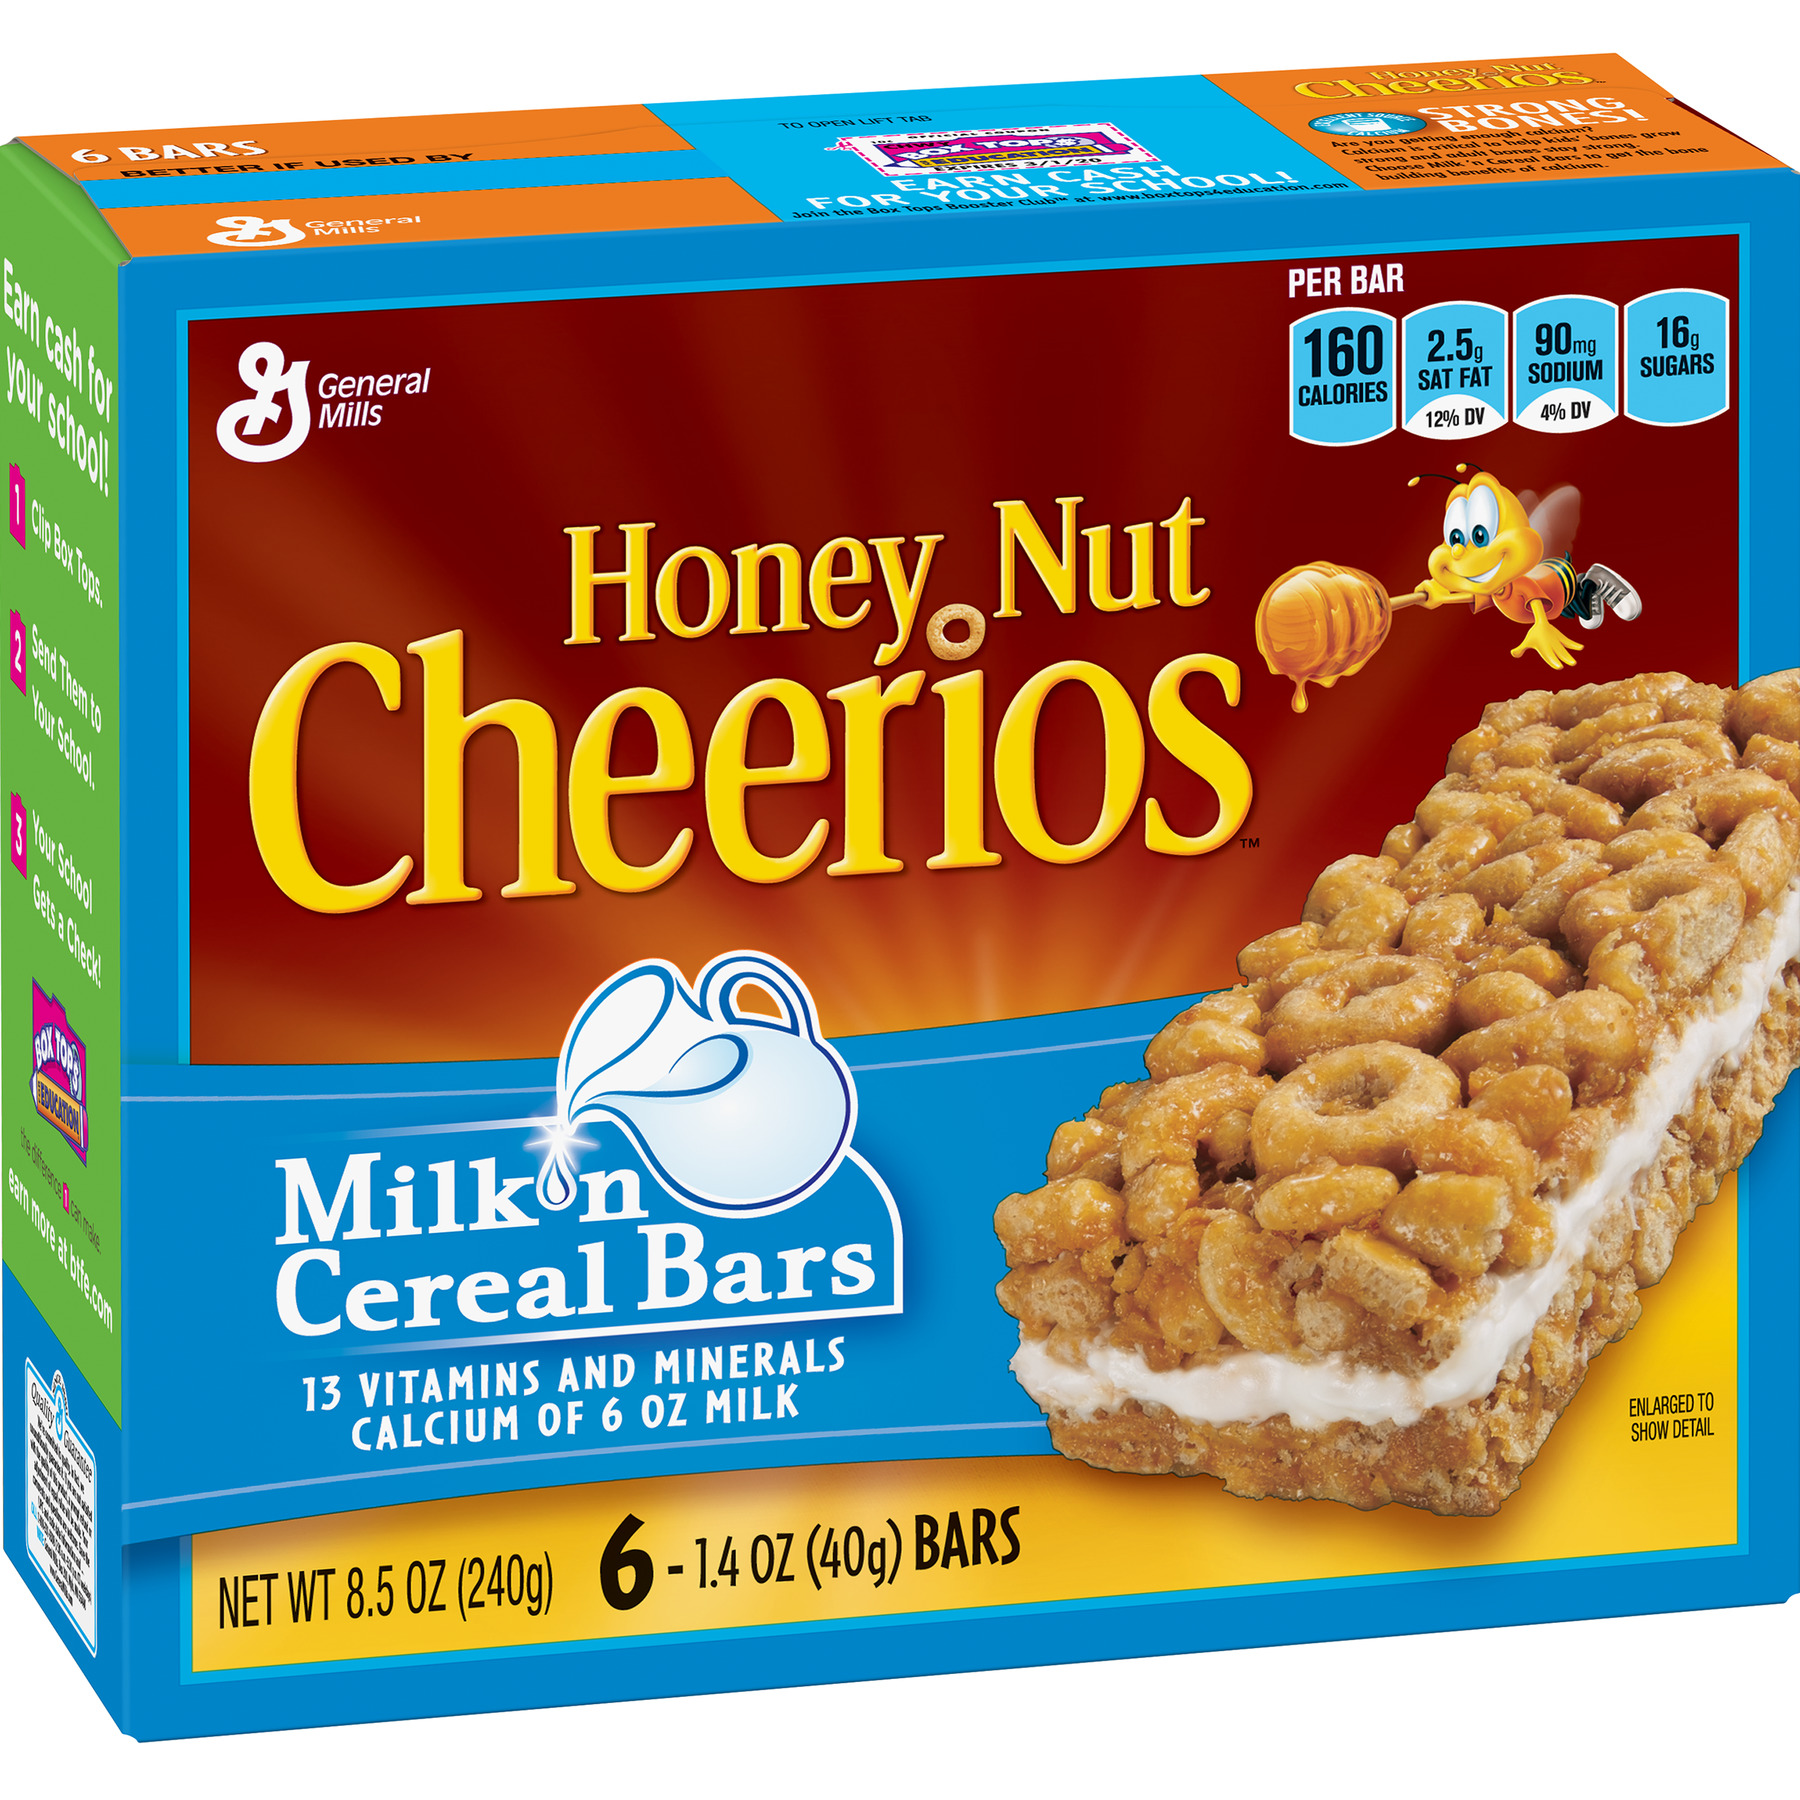 Honey Nut Cheerios Milk 'N Cereal Bars Treat Bar, 8.5 oz